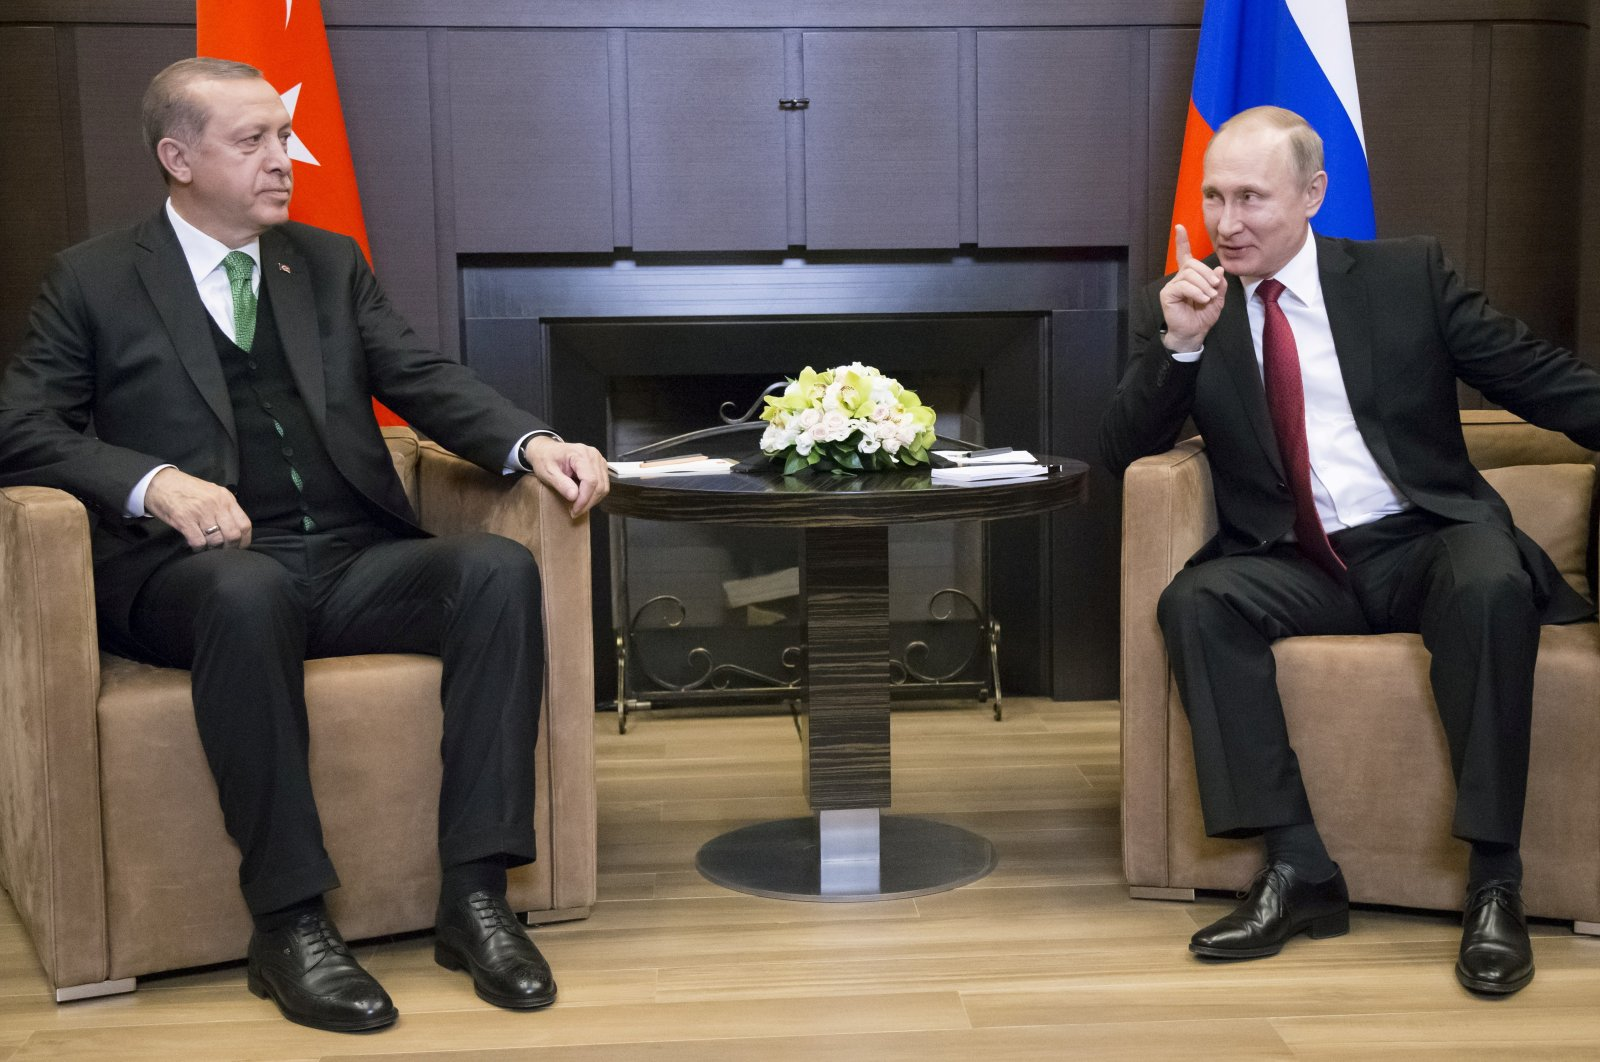 Russian President Vladimir Putin (R) meets with his Turkish counterpart Recep Tayyip Erdoğan in Sochi, Russia, May 3, 2017. (REUTERS Photo)